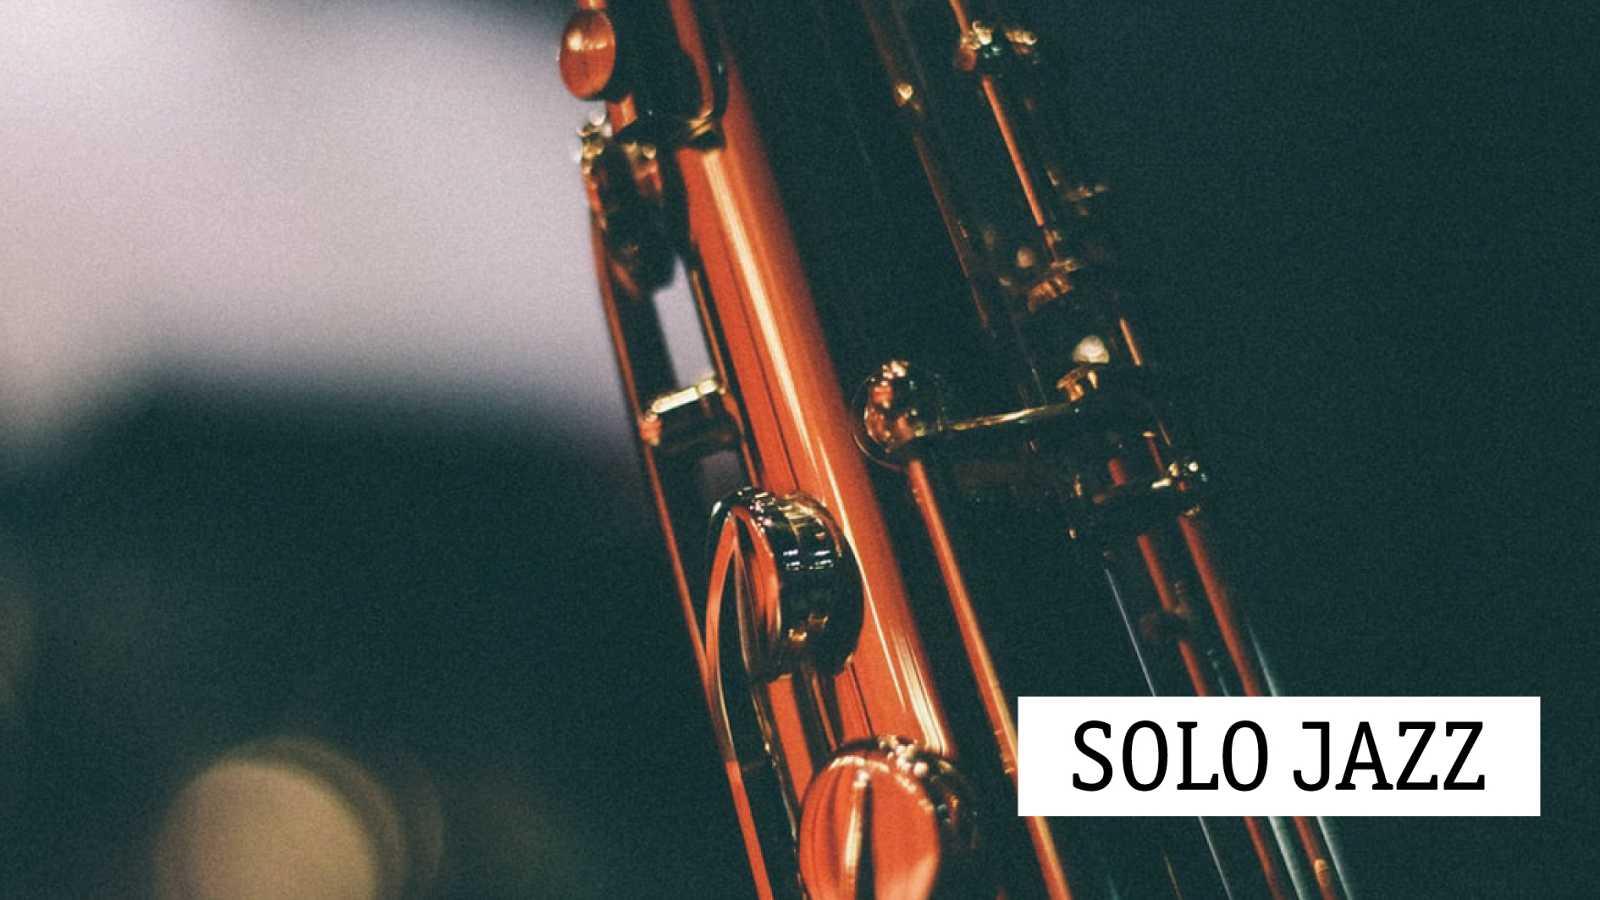 Solo jazz - Tal Farlow: Fina orfebrería guitarrística - 11/11/20 - escuchar ahora